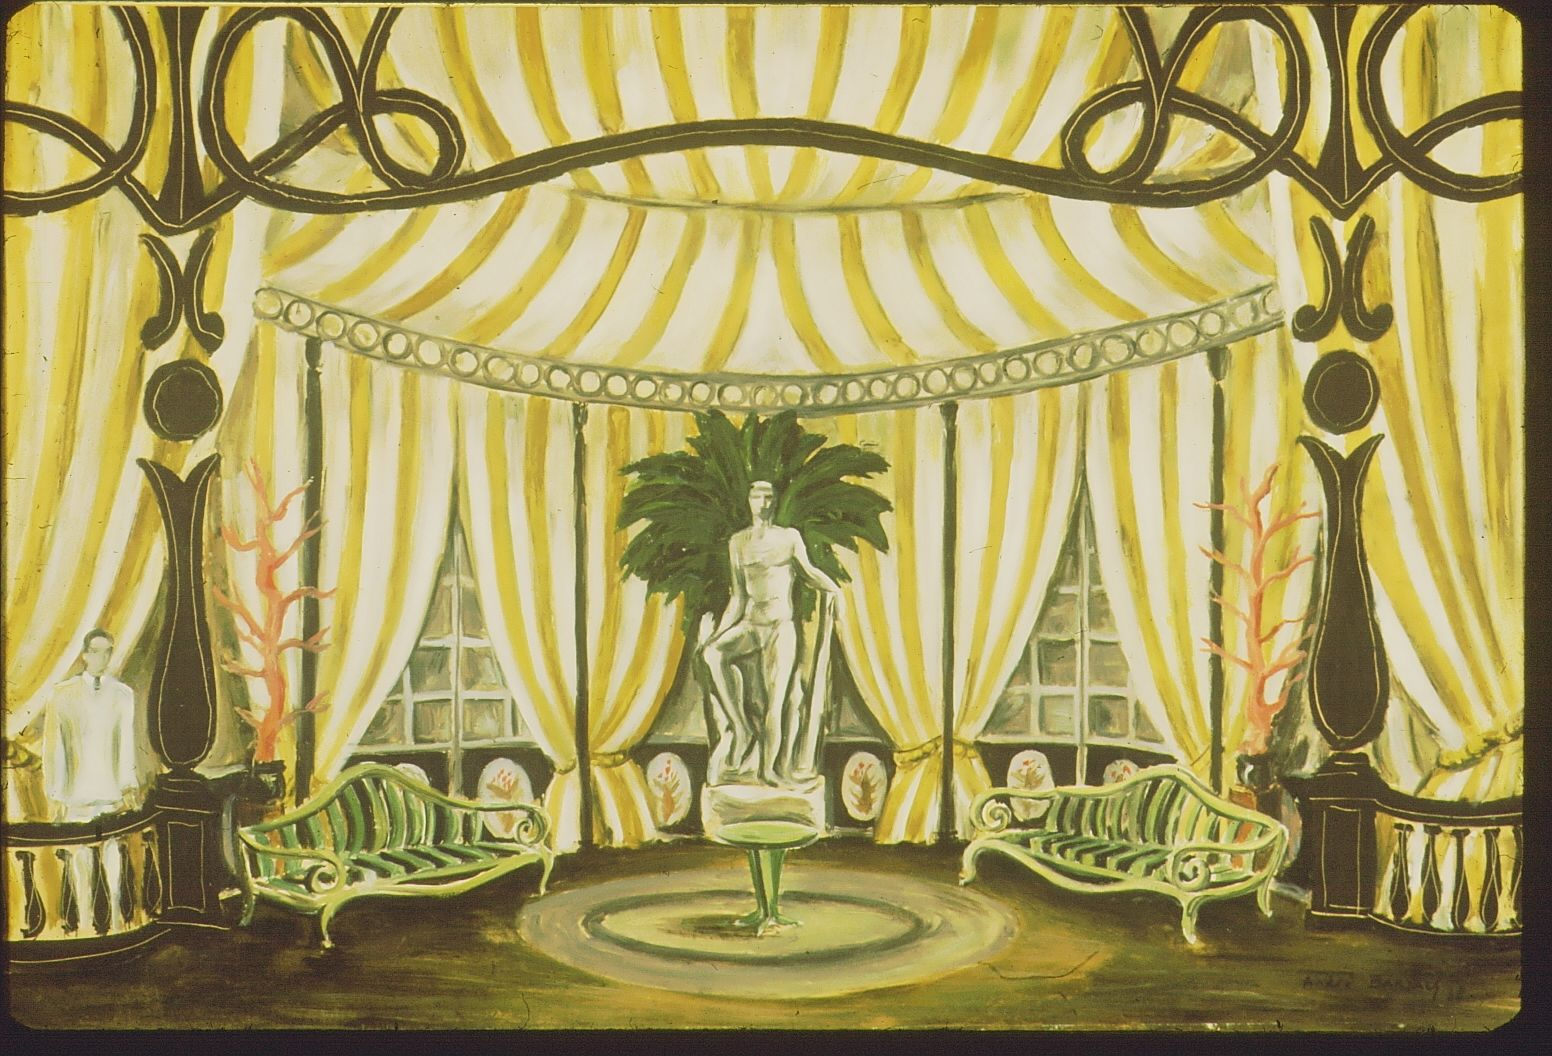 1930s: Set Design , Genres | The Red List